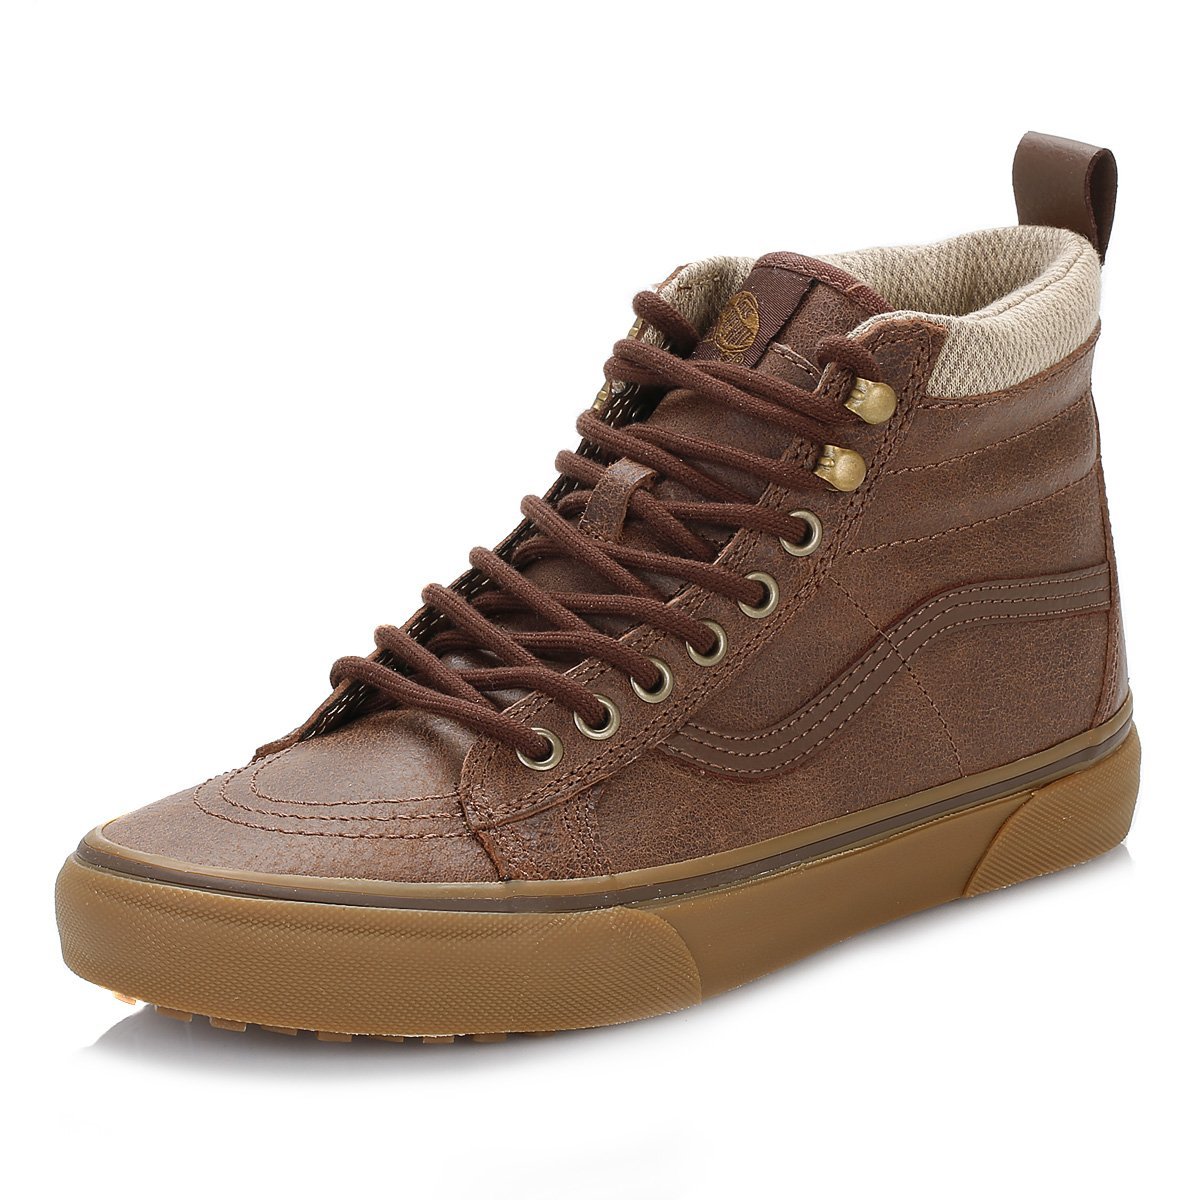 Vans Mens Brown/Herringbone SK8-Hi MTE Trainers: Amazon.ca: Shoes ...